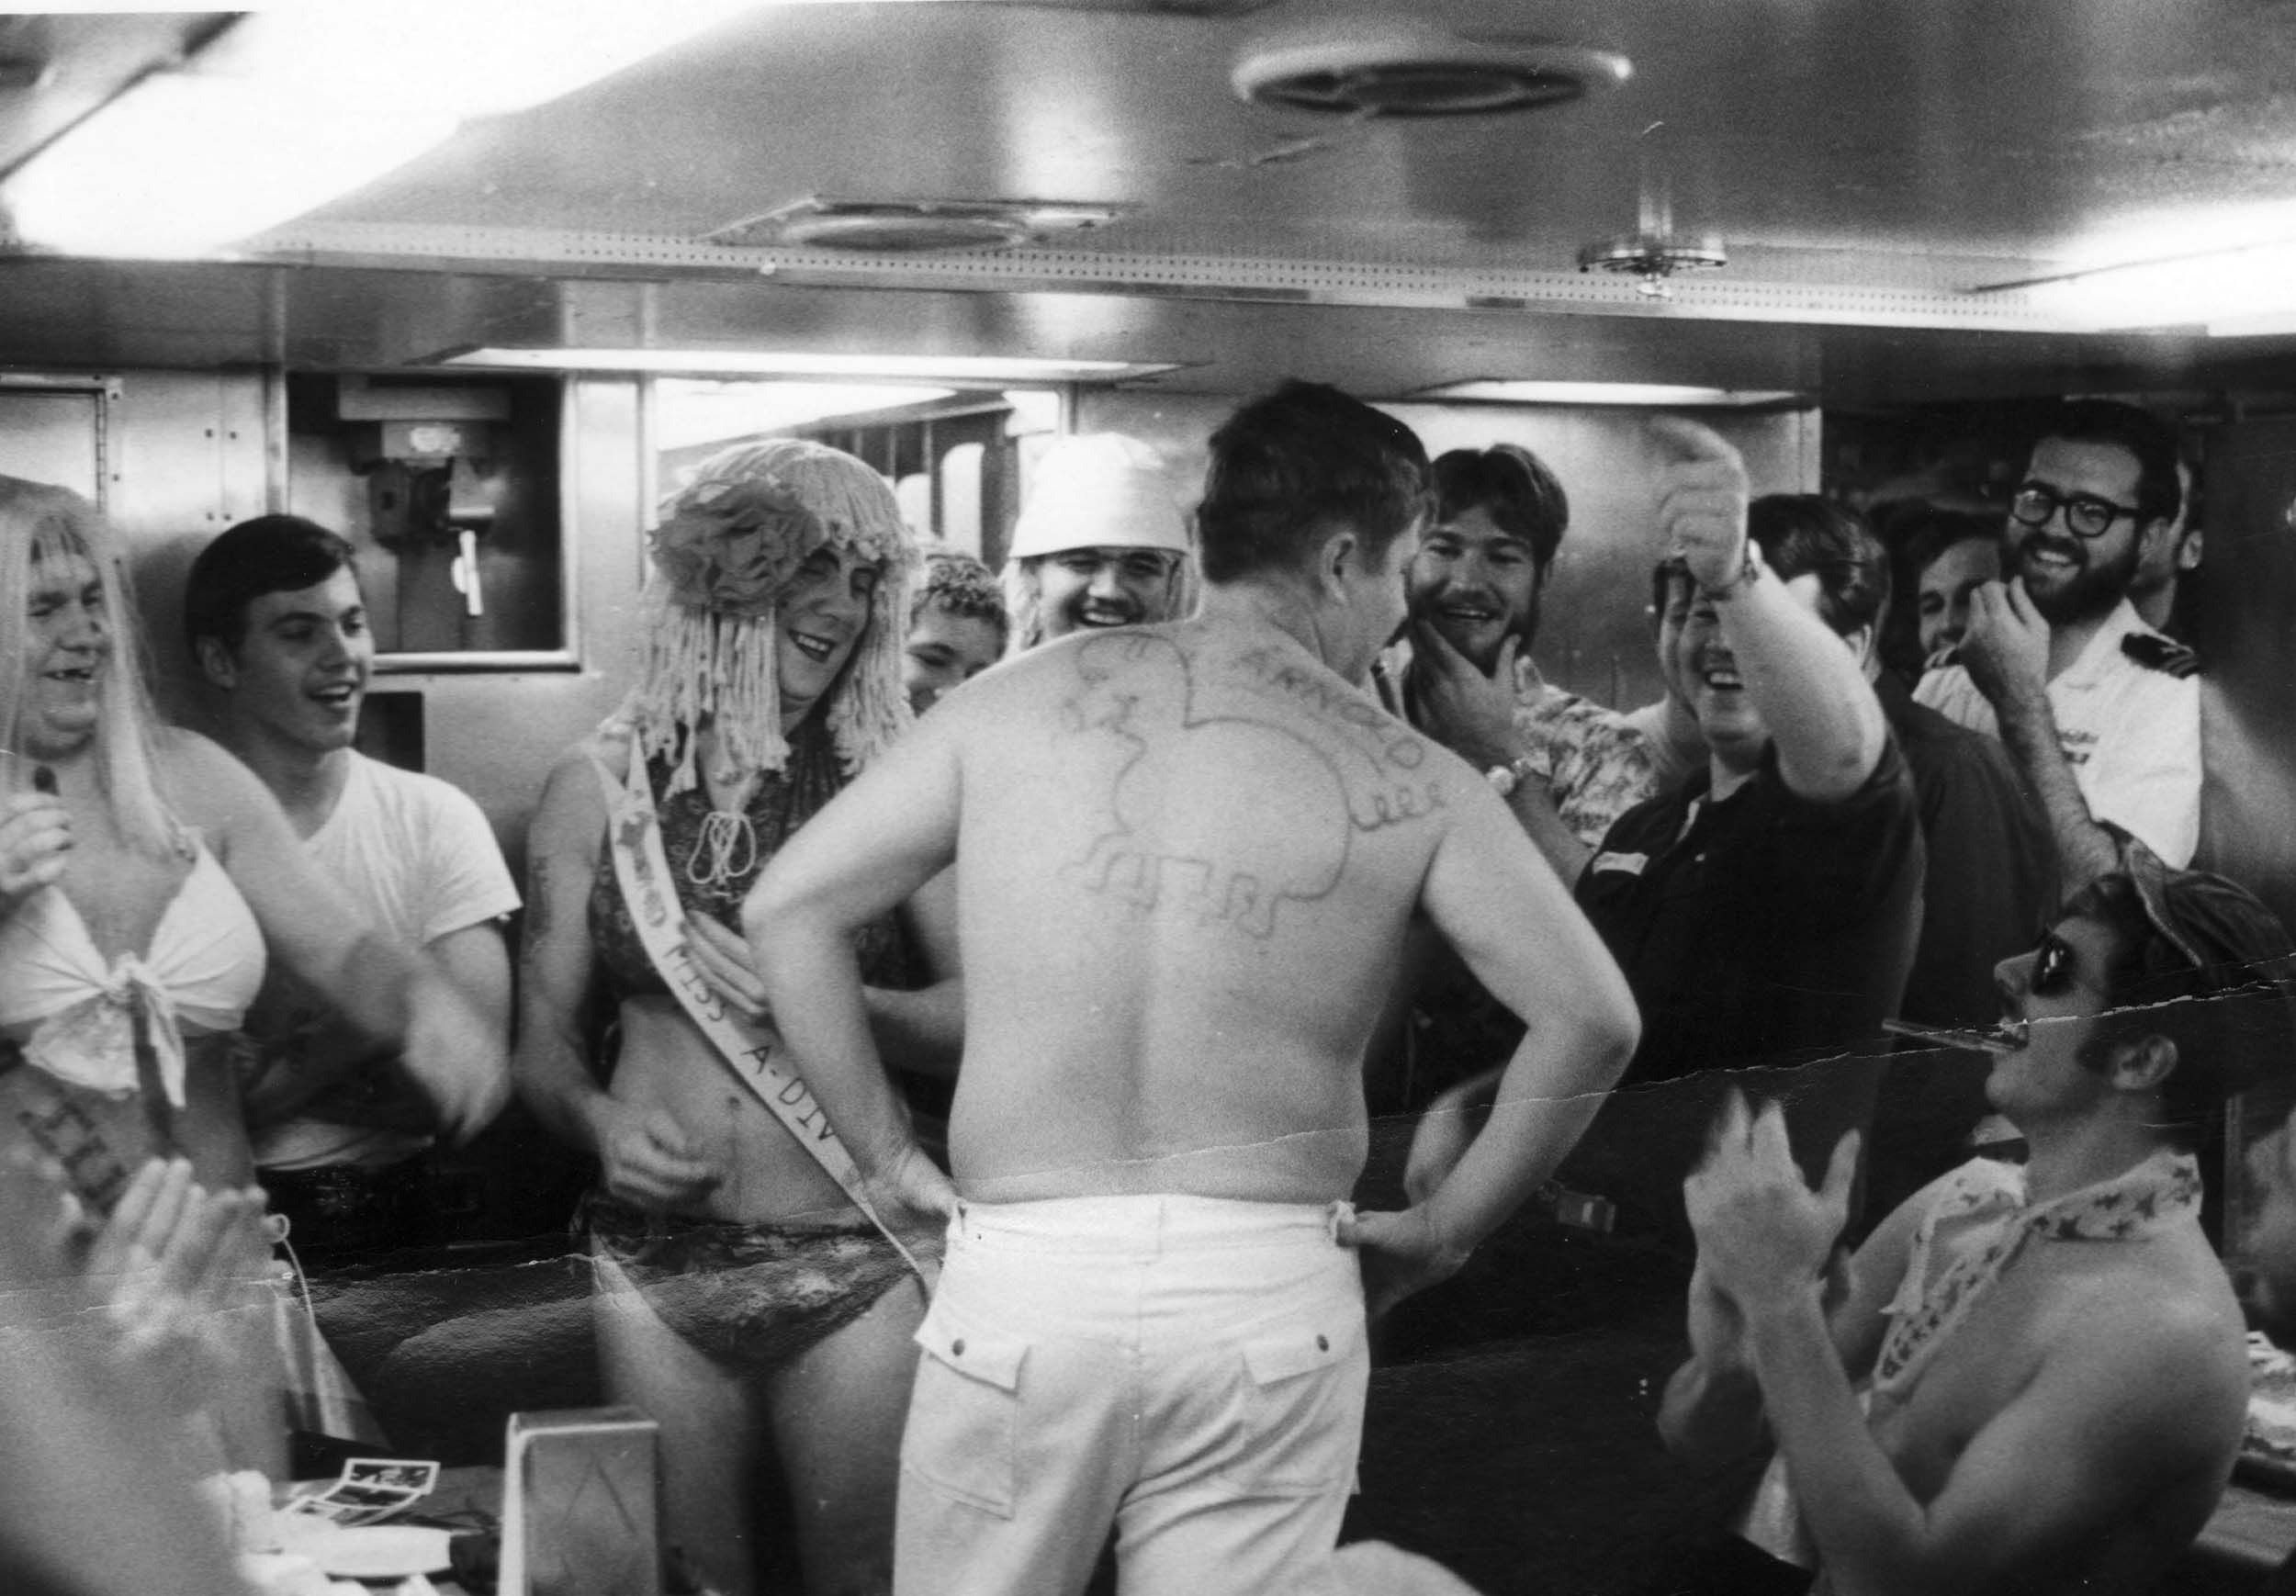 Halfway Night 1975 on the USS George Washington SSBN 598